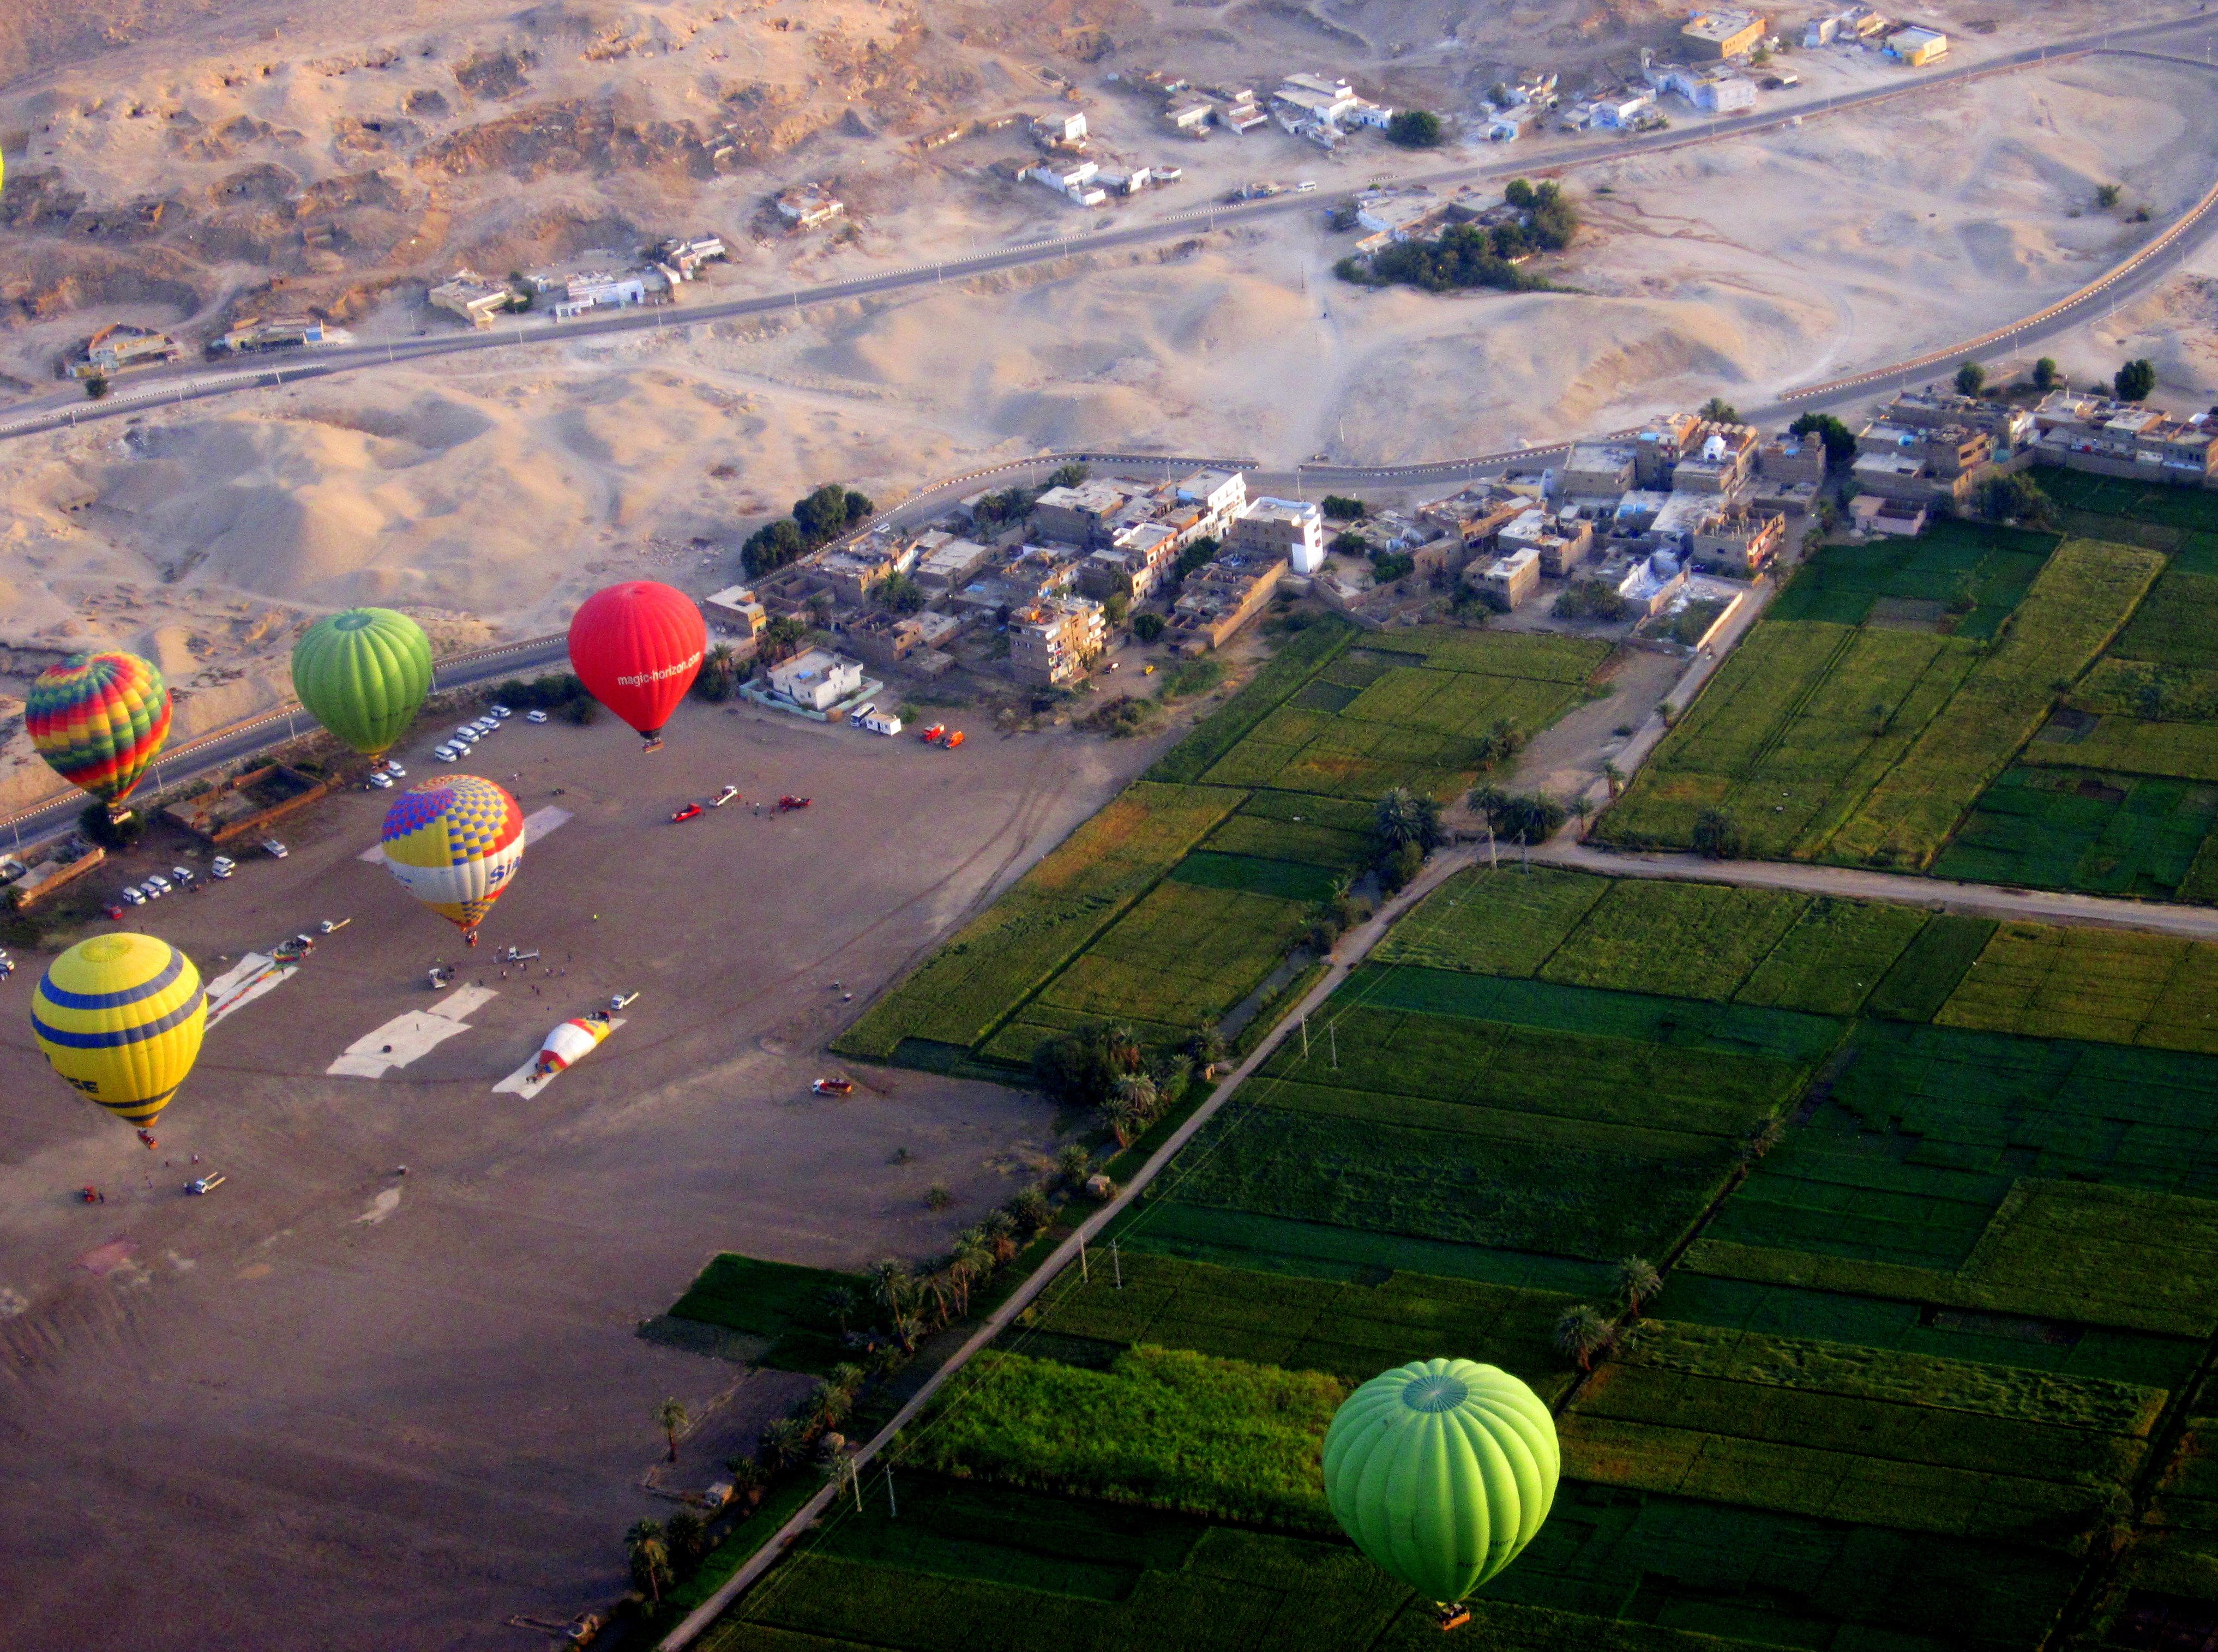 #egypt #egypttourism #Luxor #Luxortourism #Luxorhotairballooning #